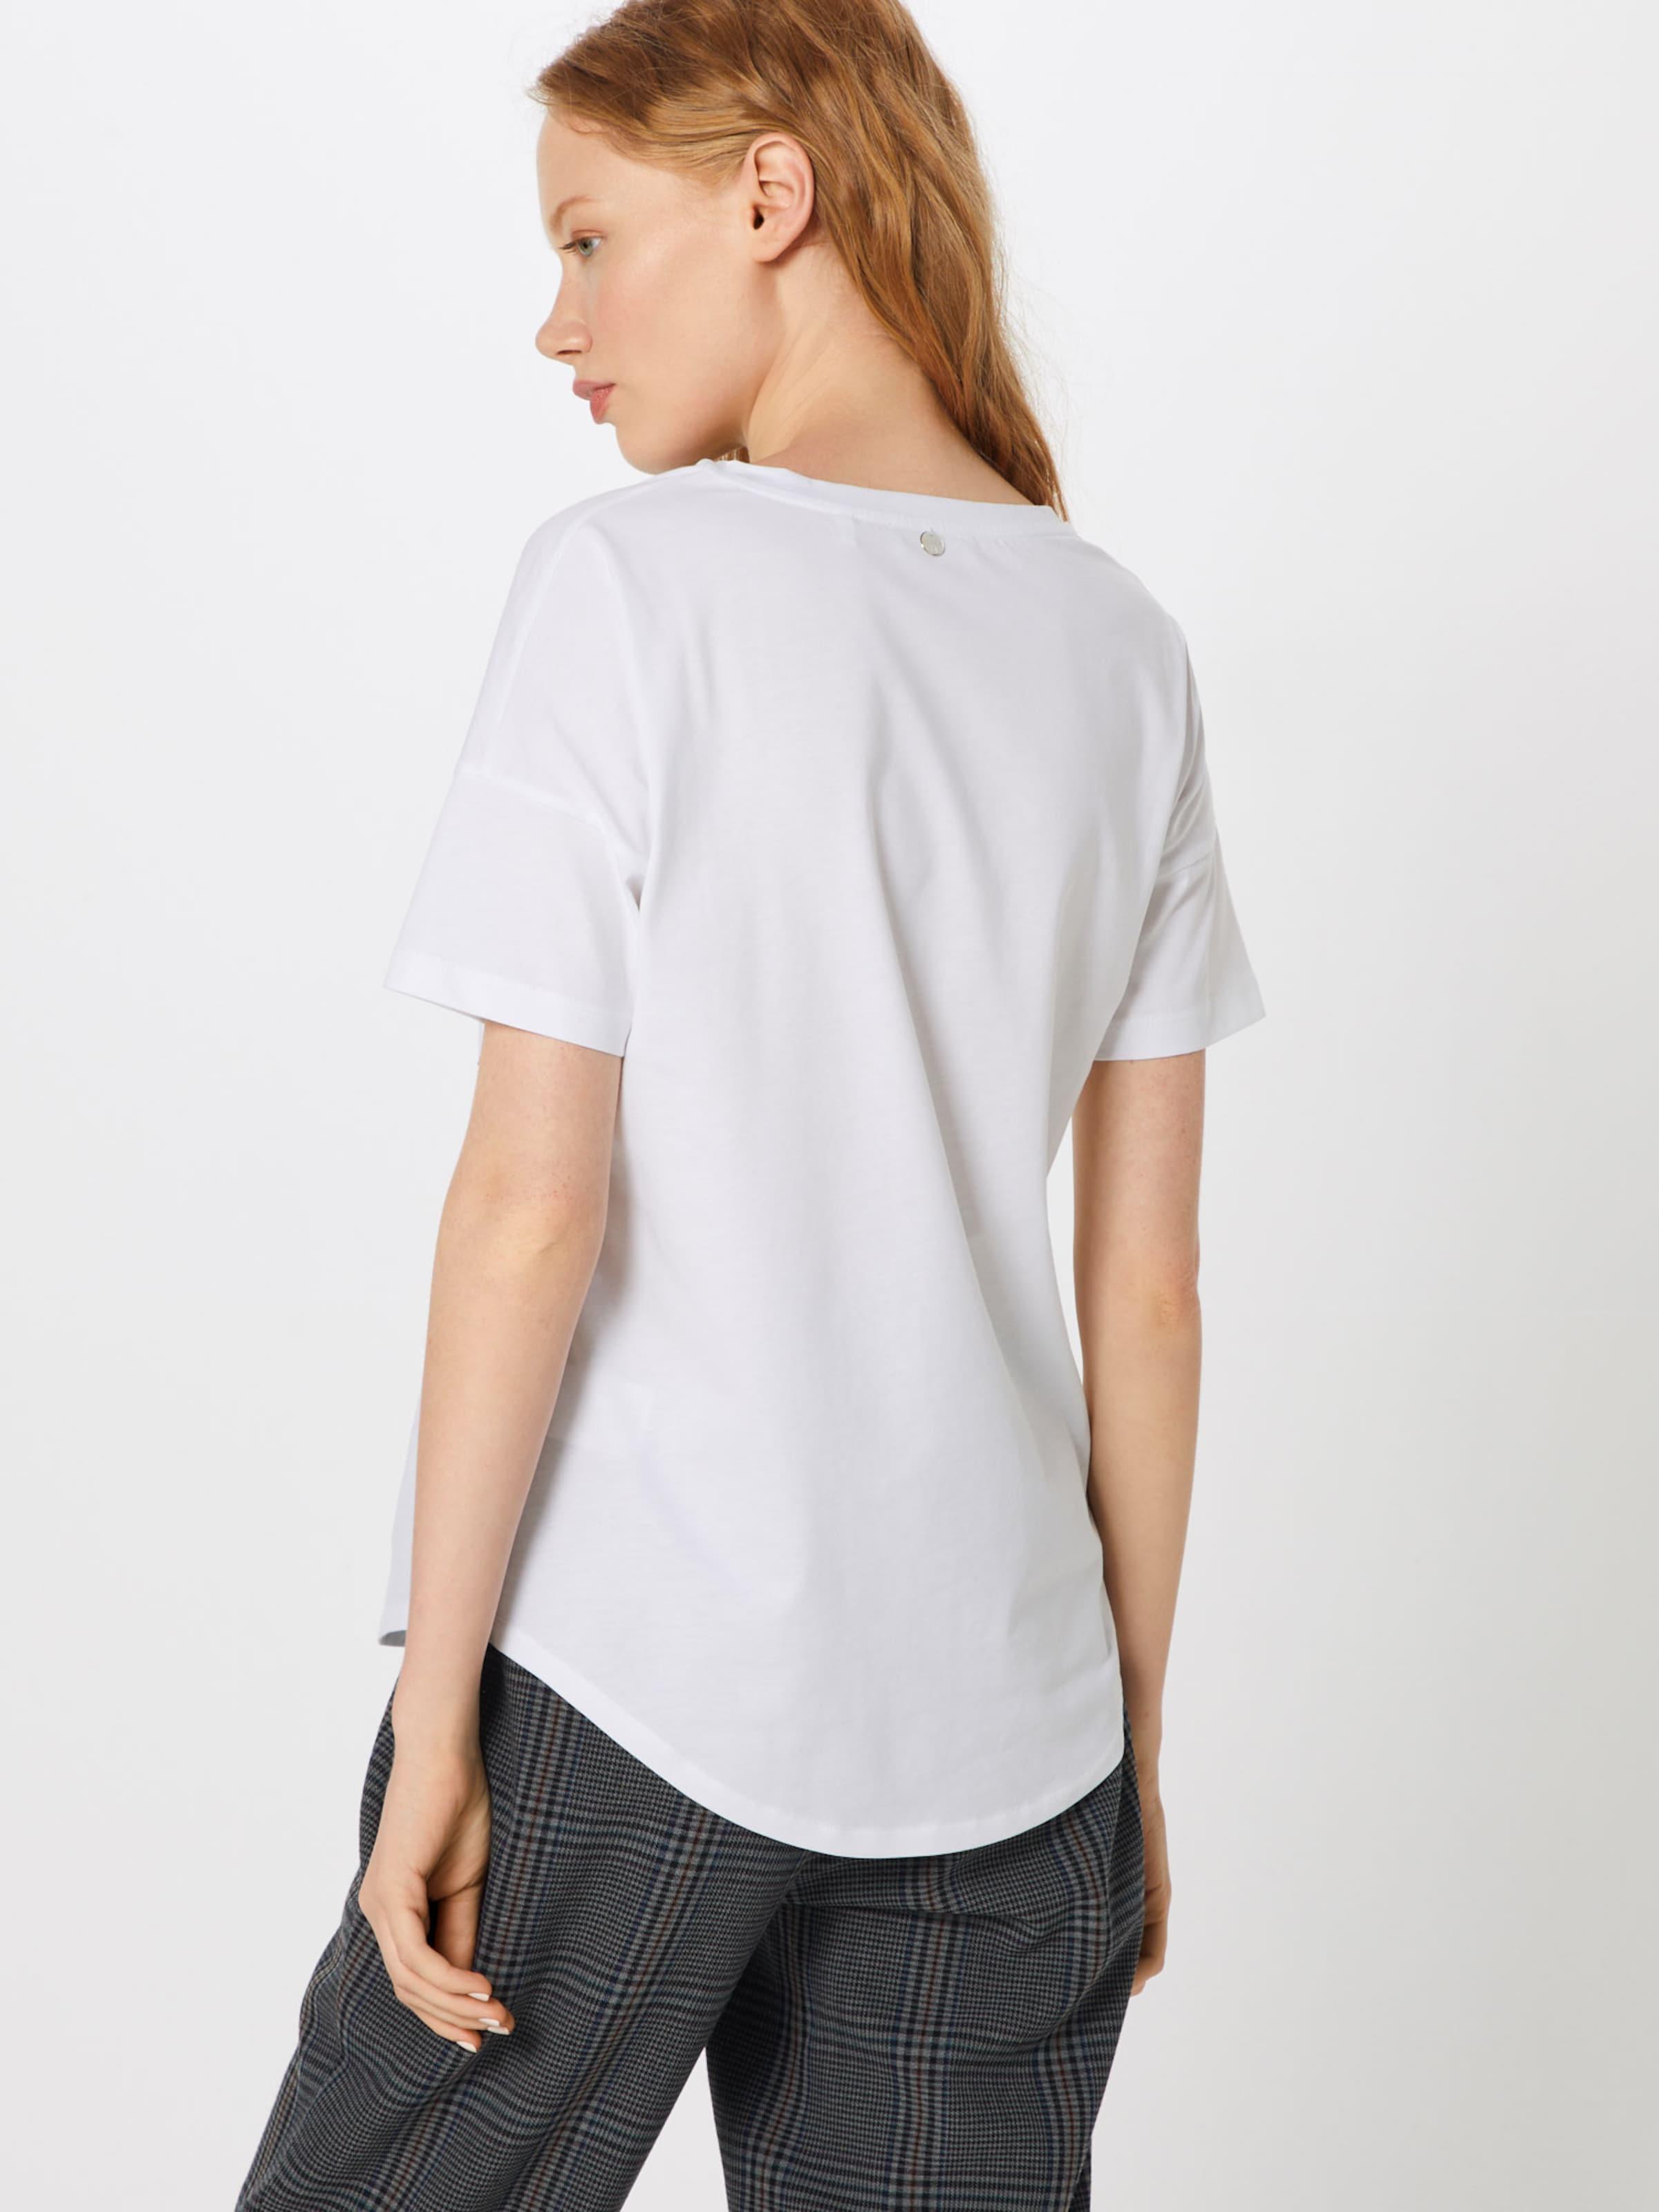 SchwarzWeiß shirt Royal T In Richamp; XOTwkuZPil